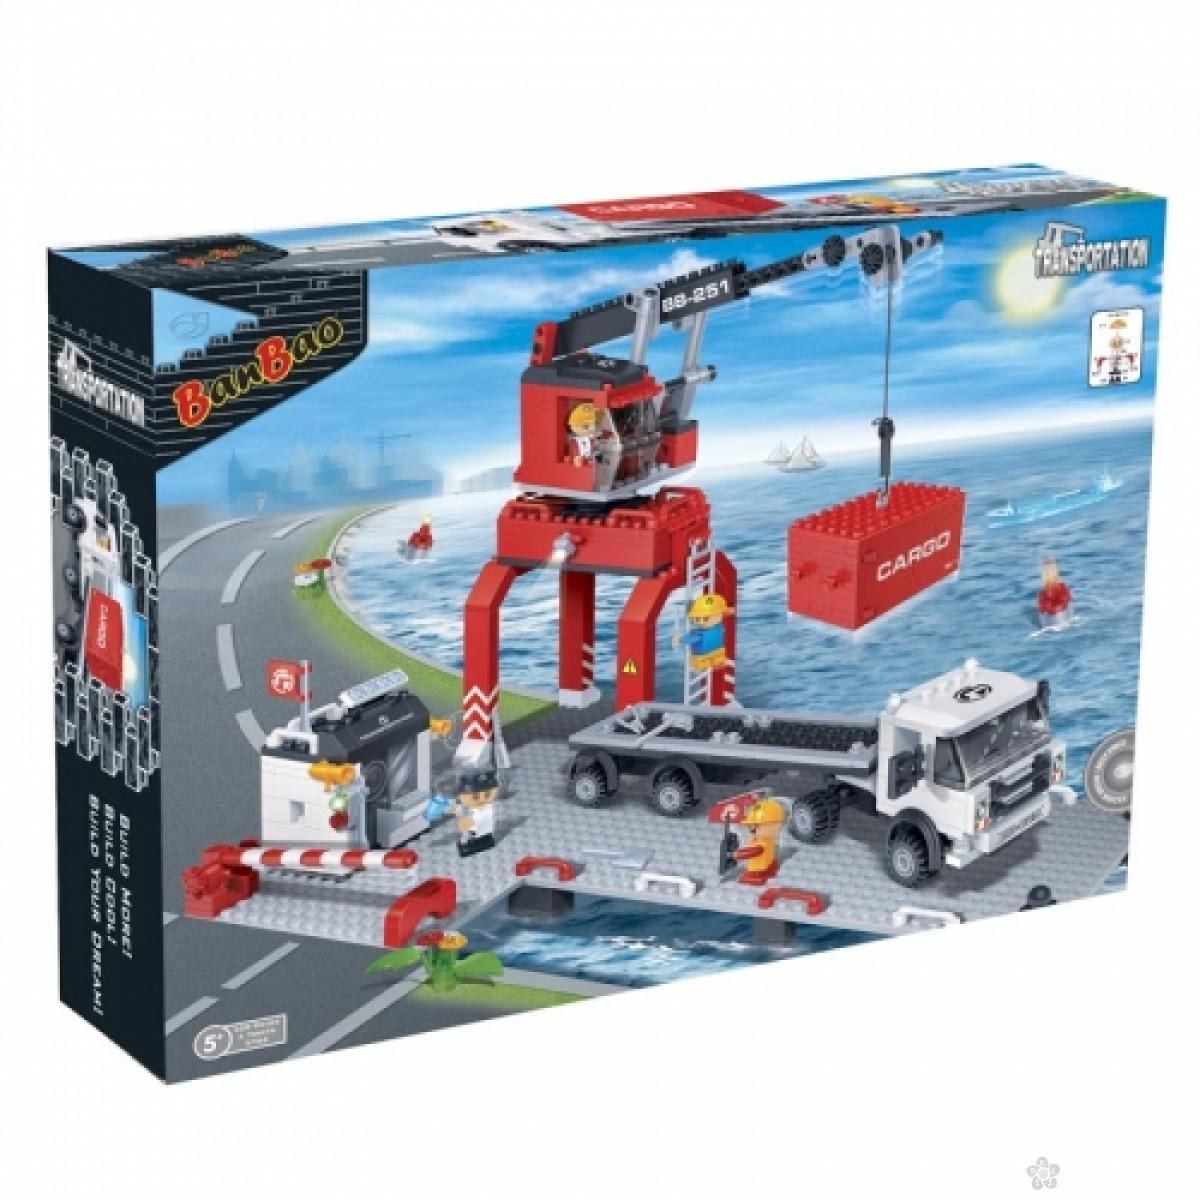 Utovarivač transporta u luci, 8766